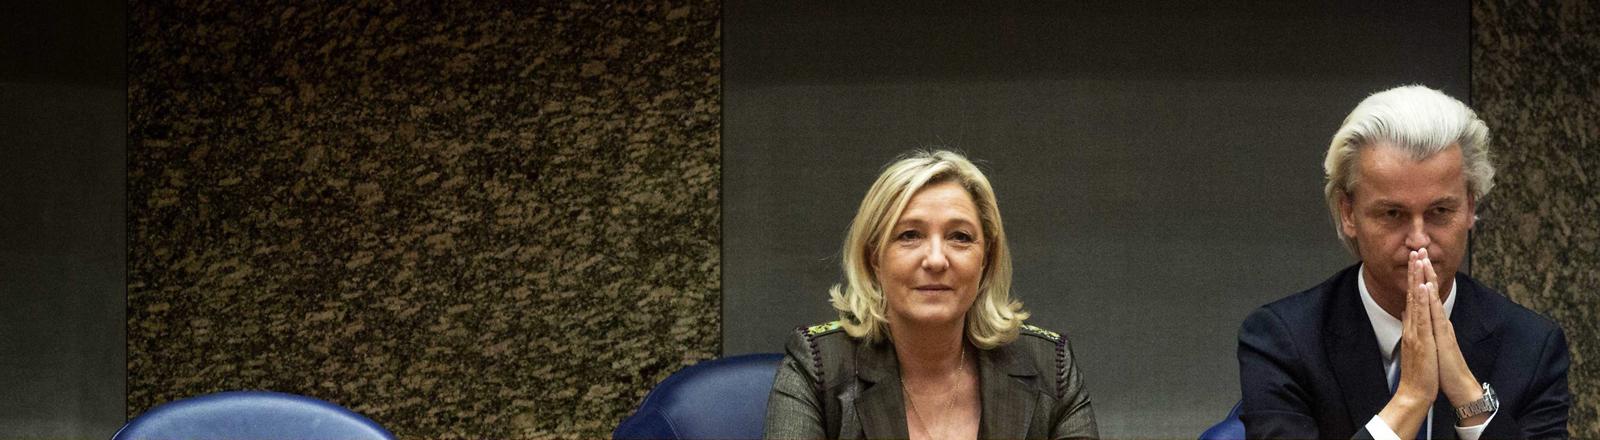 Marine Le Pen und Geert Wilders